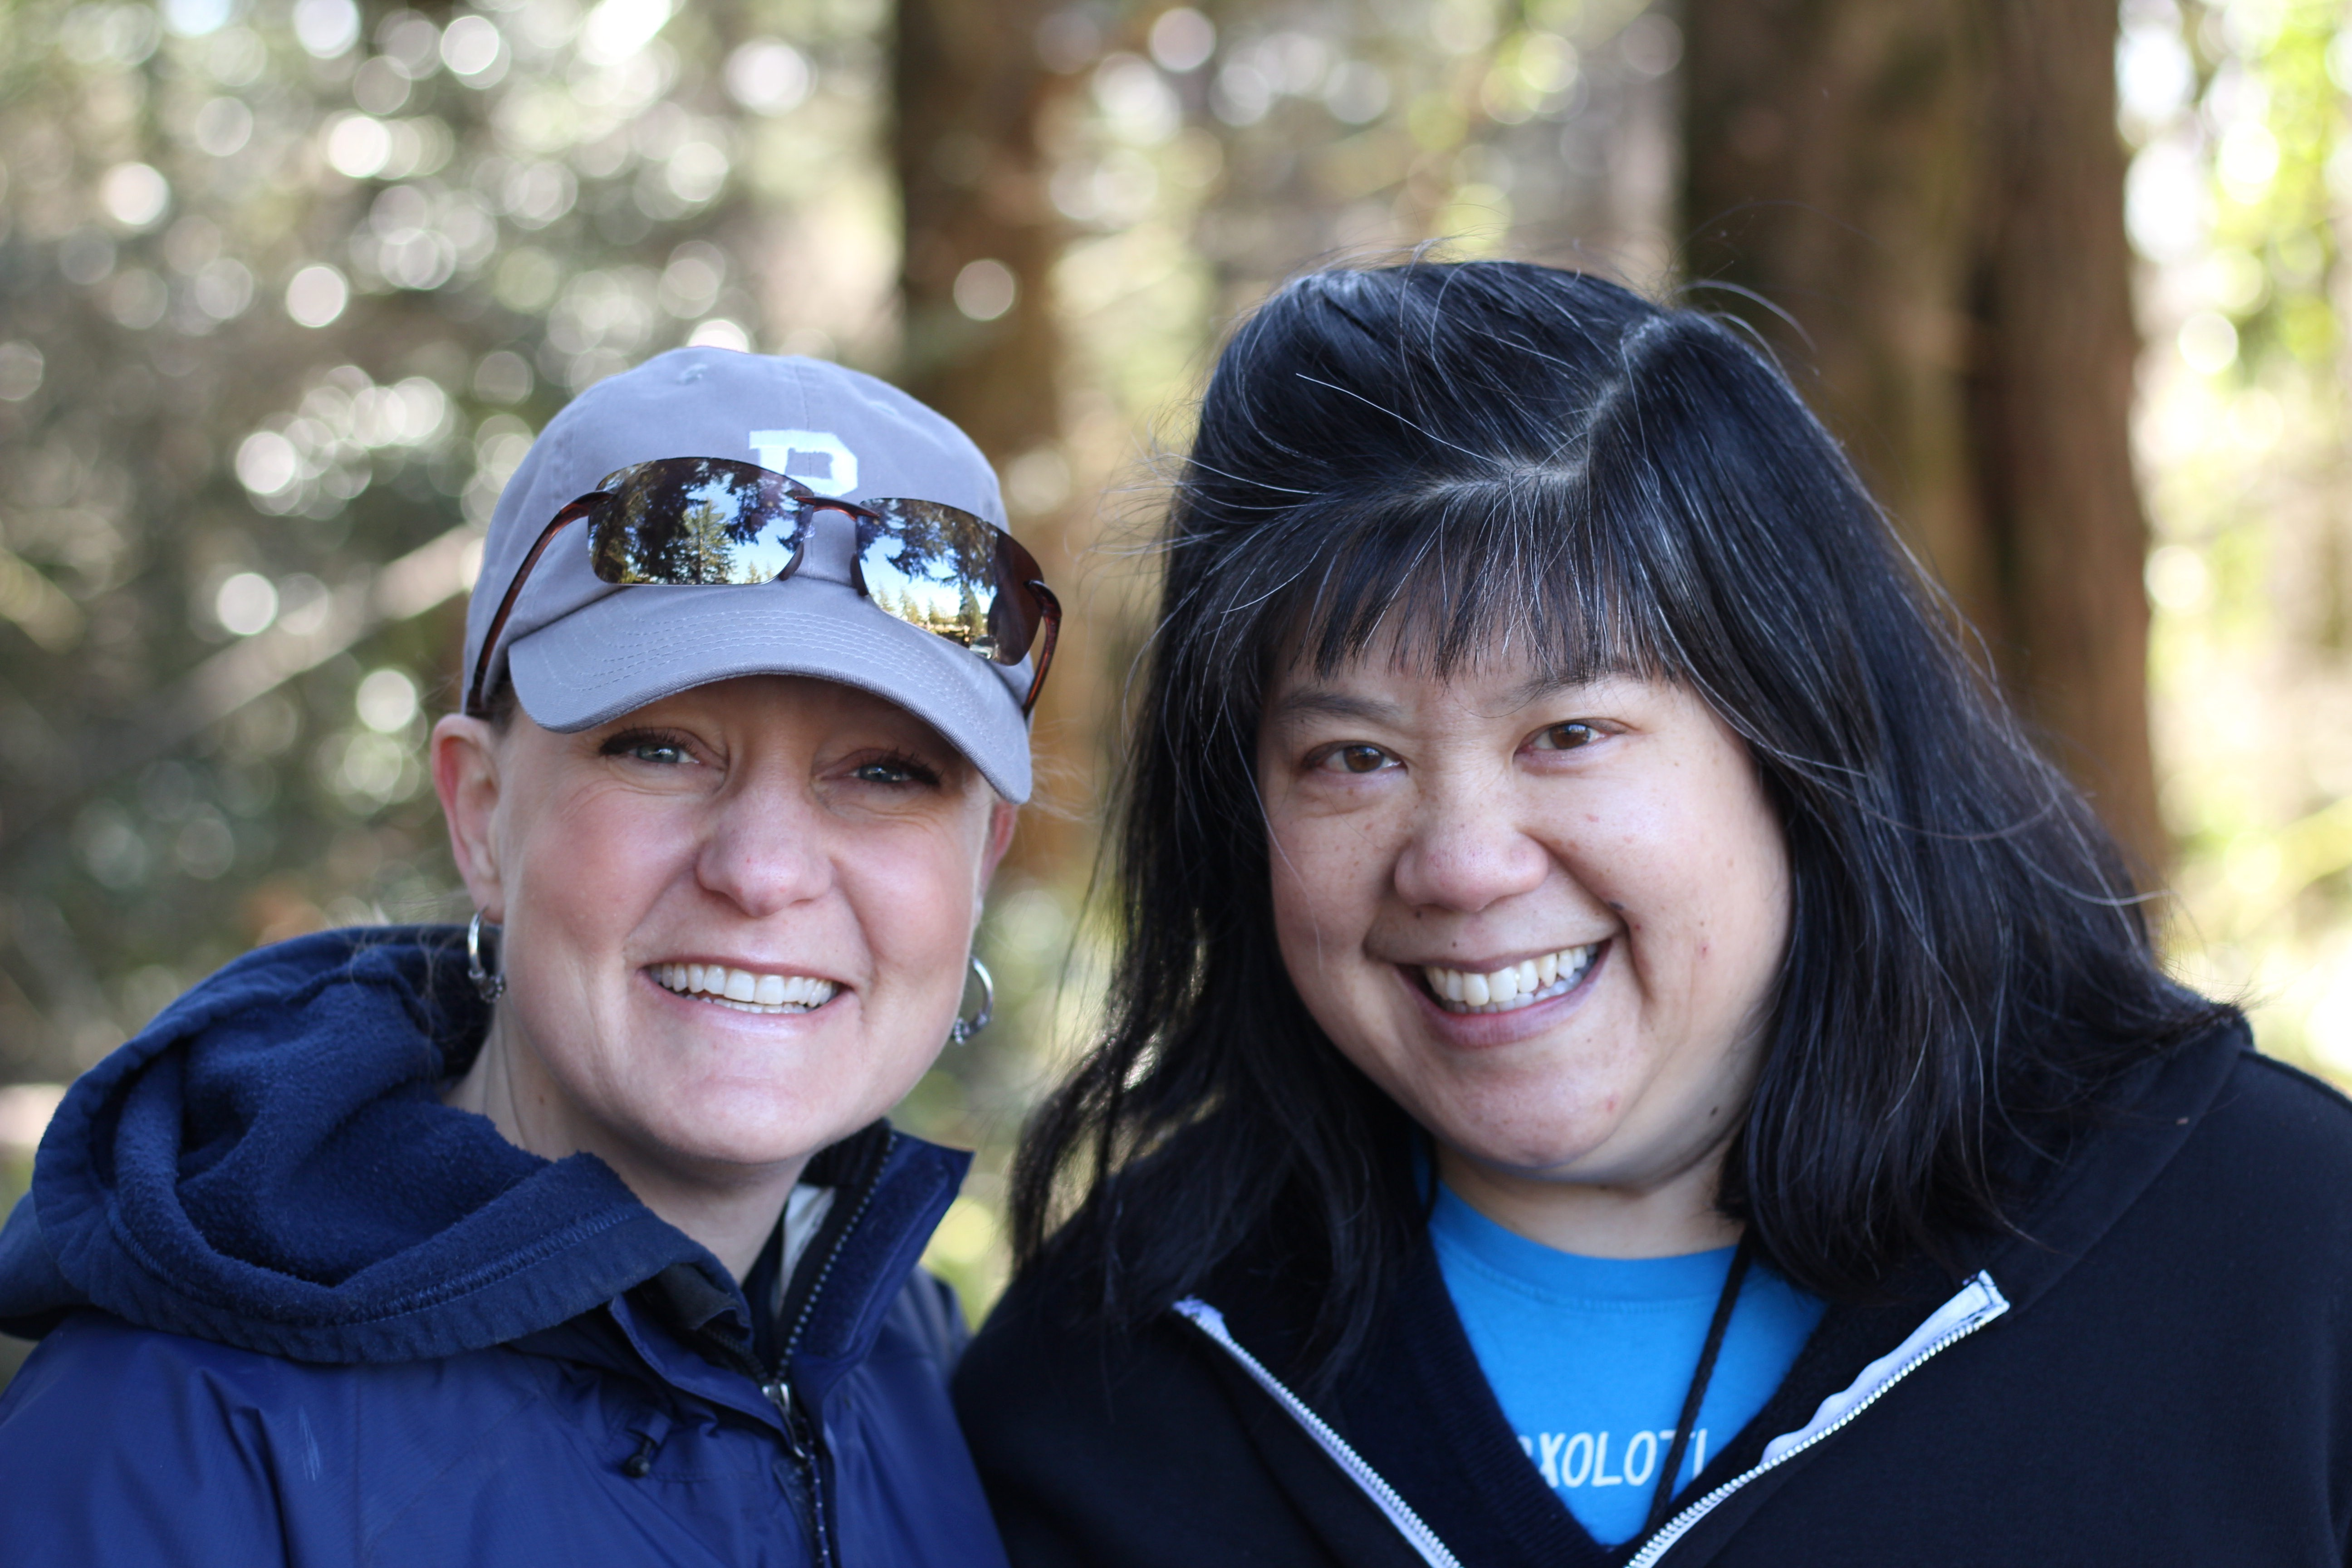 Terri Preeg Riggsby & April Ann Fong